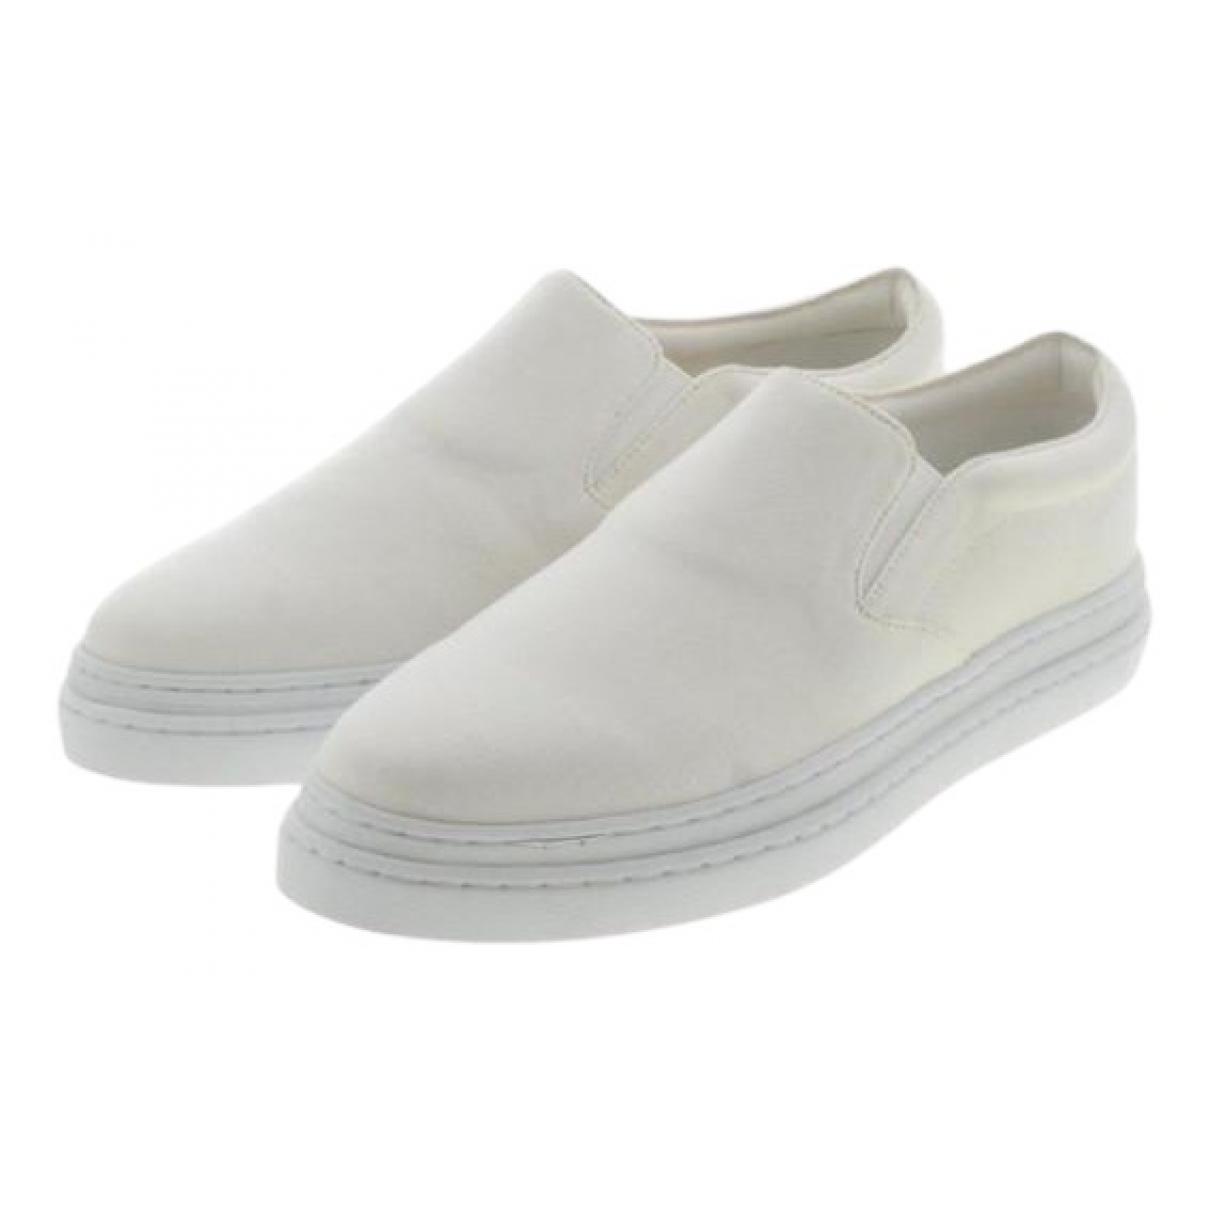 Comme Des Garcons N White Cloth Trainers for Women 38 EU